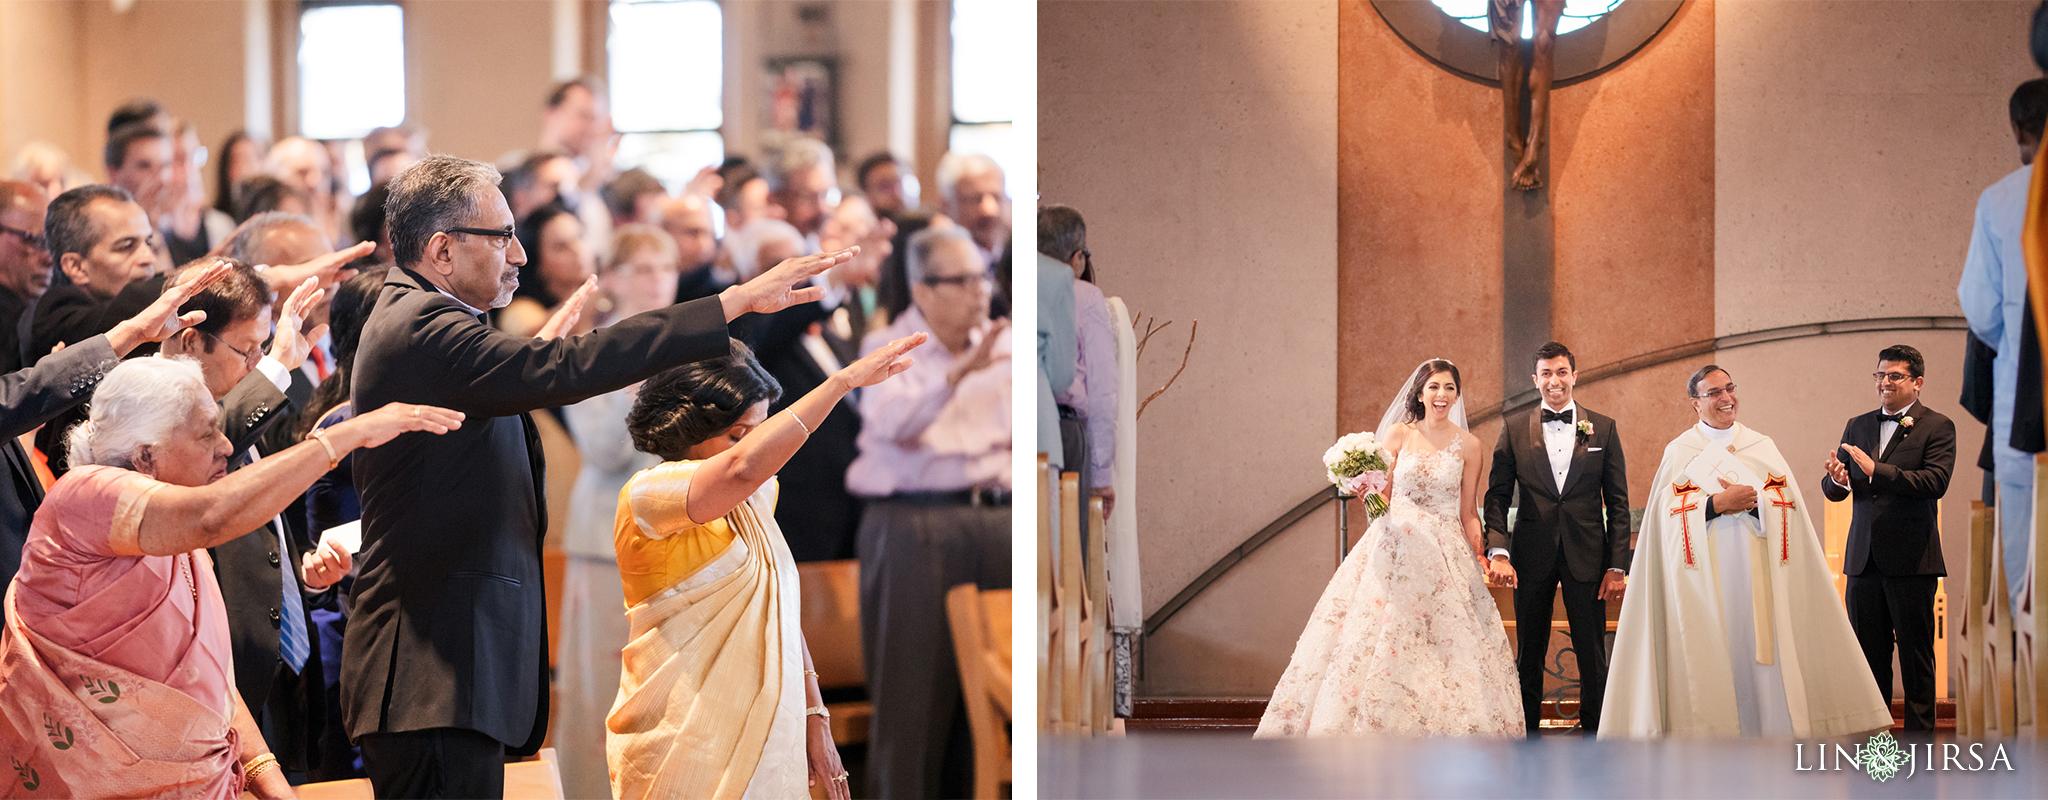 14 Newport Beach Marriott Indian Wedding Photography 1